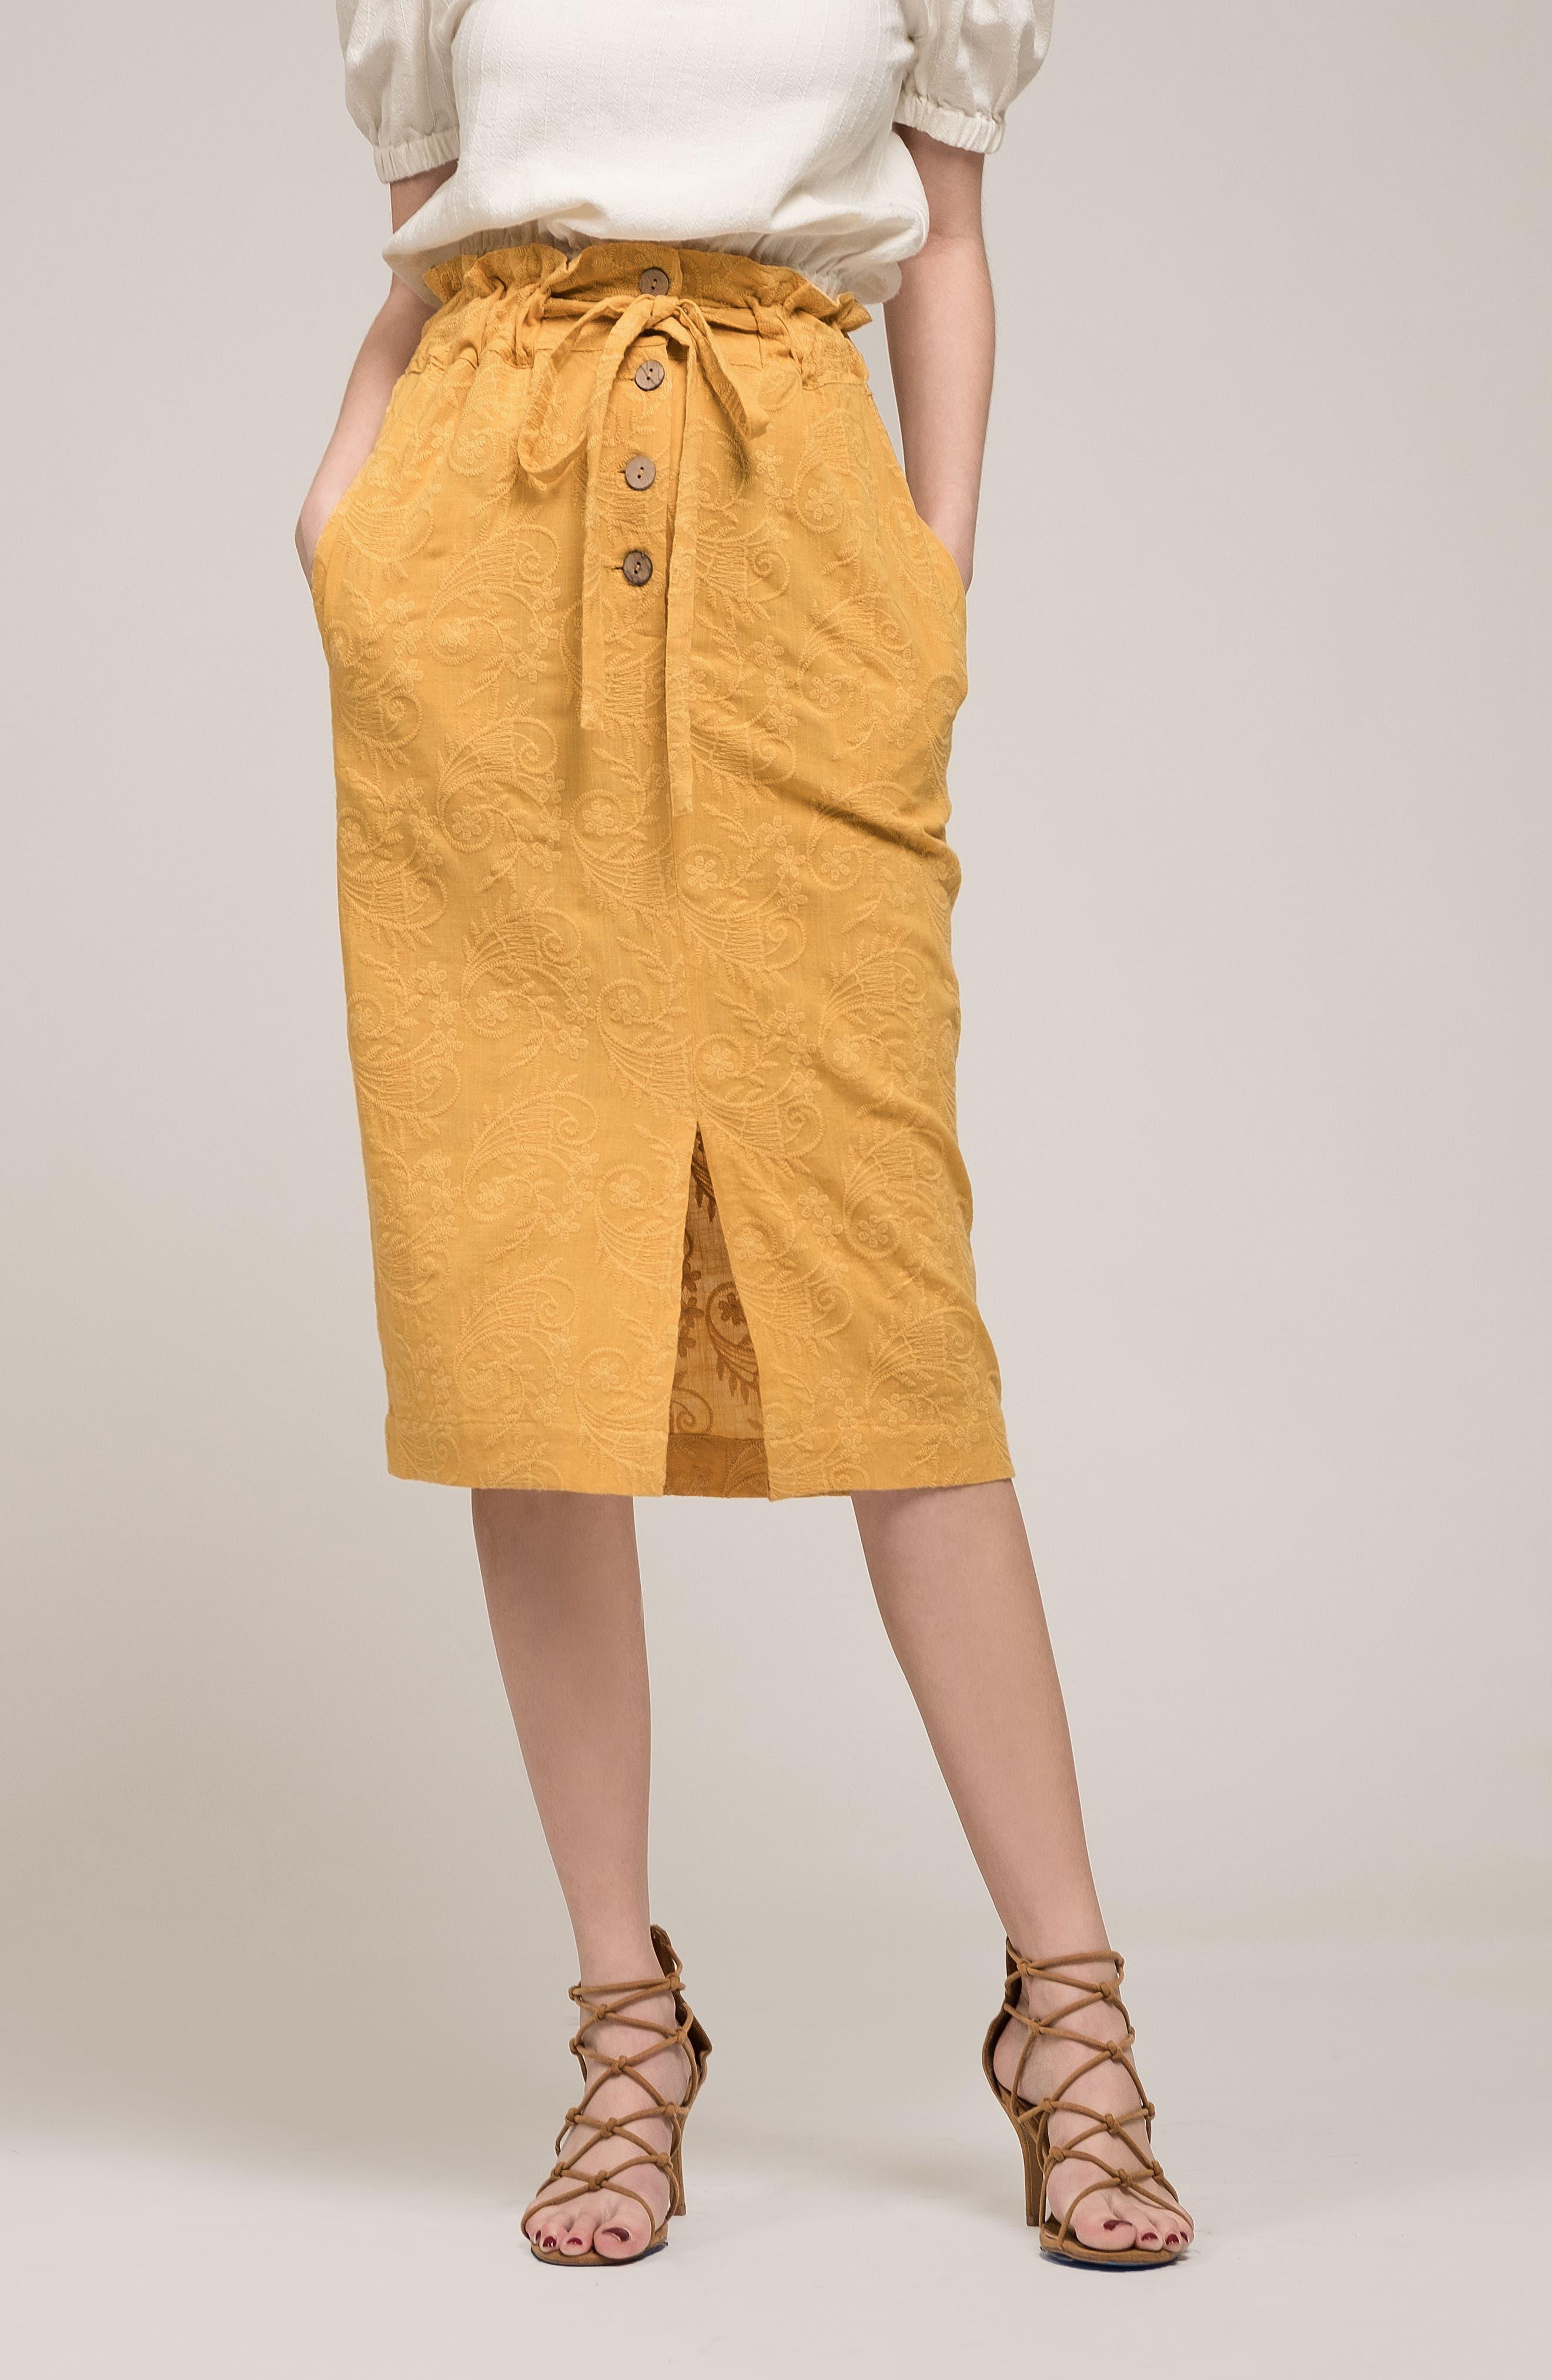 Embroidered Paperbag Waist Skirt,                             Alternate thumbnail 7, color,                             700